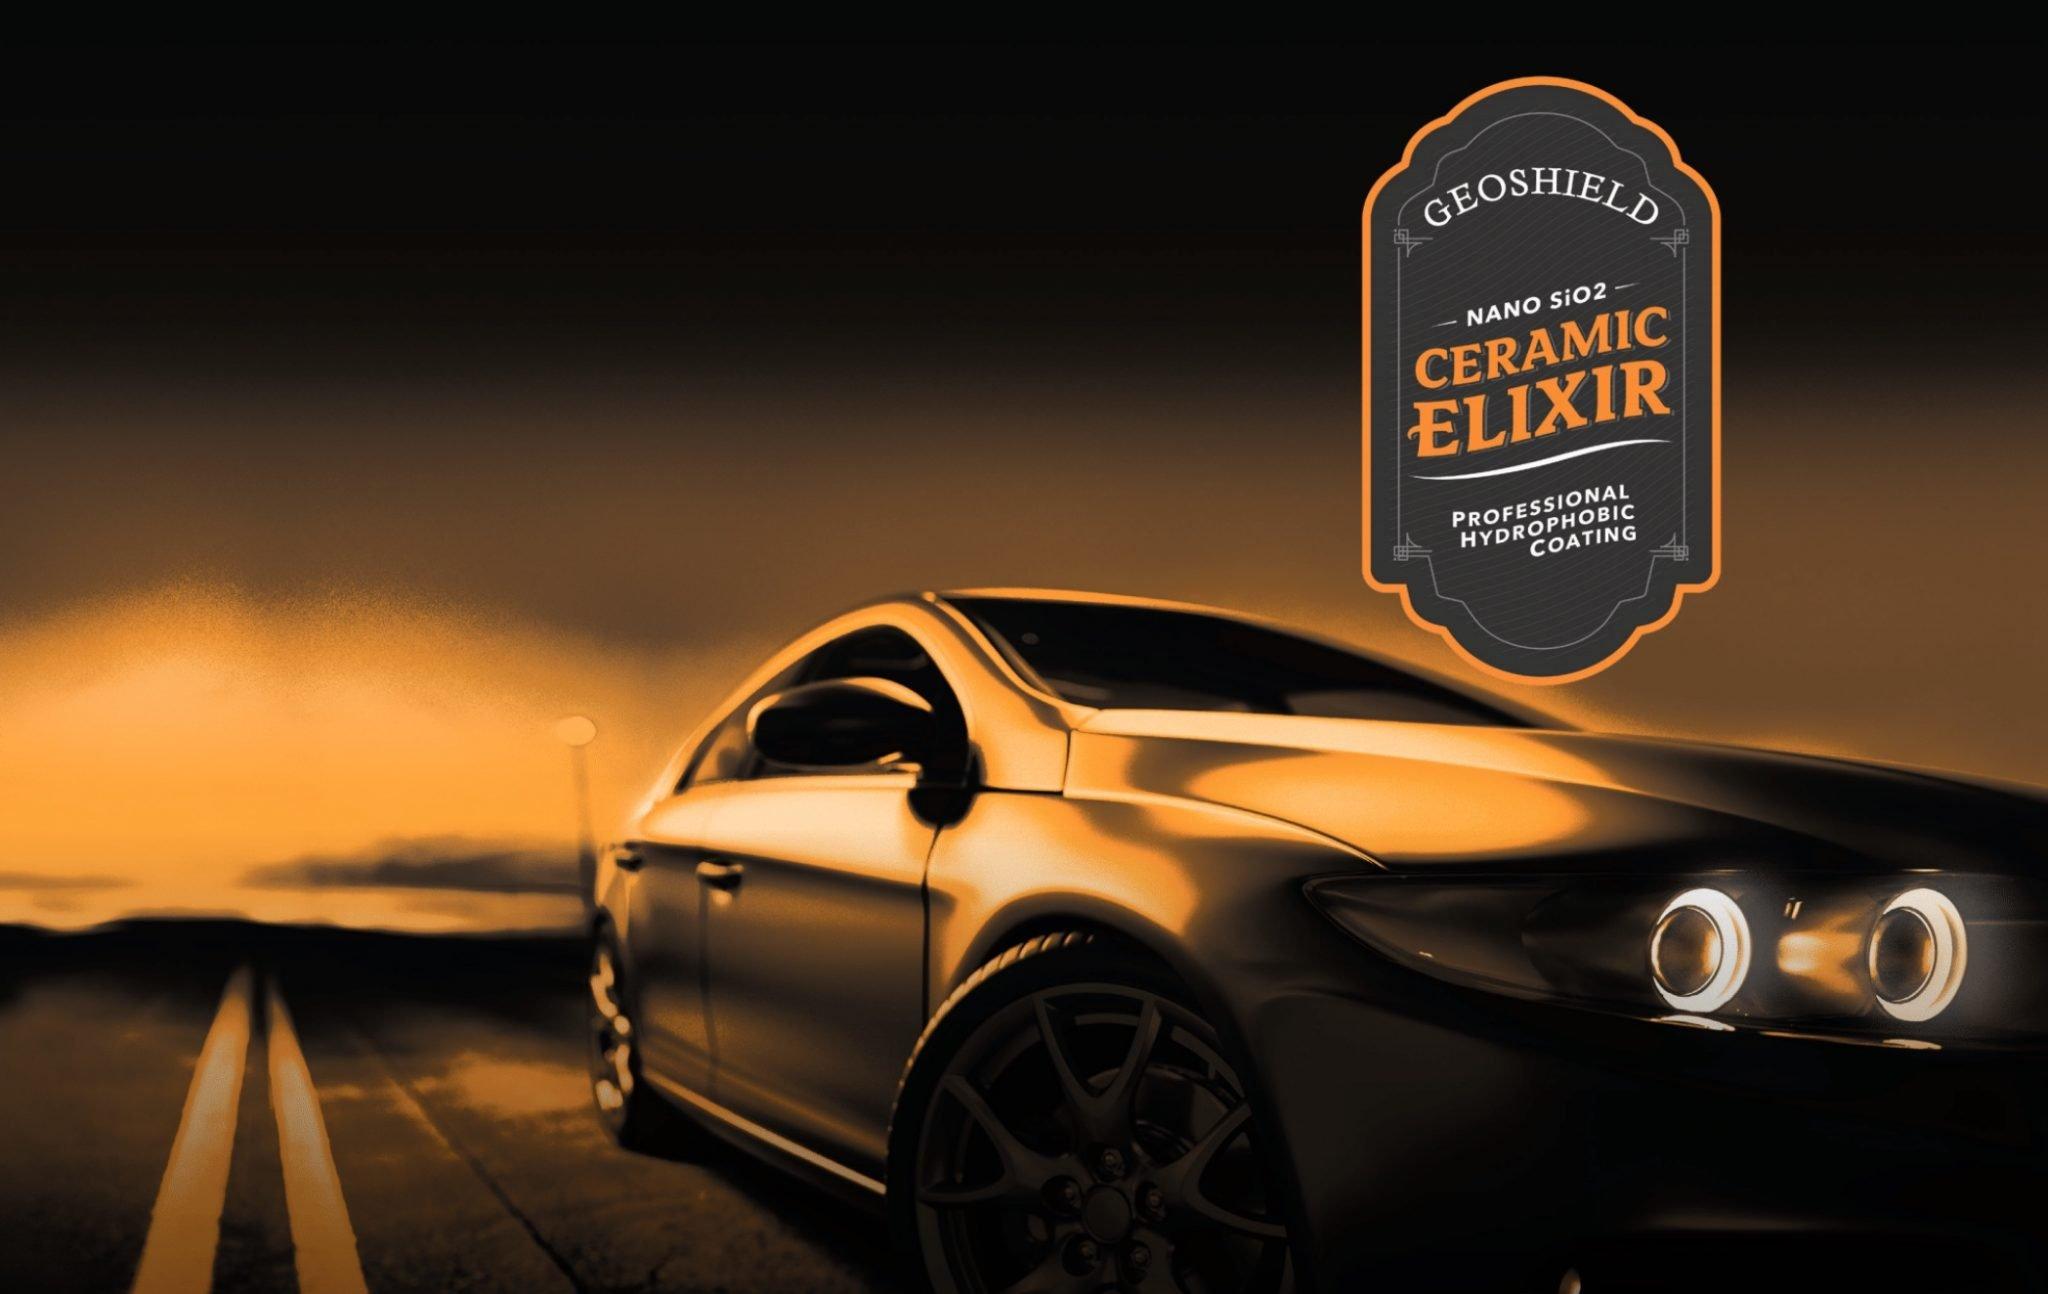 Geoshield Ceramic Elixir Coating